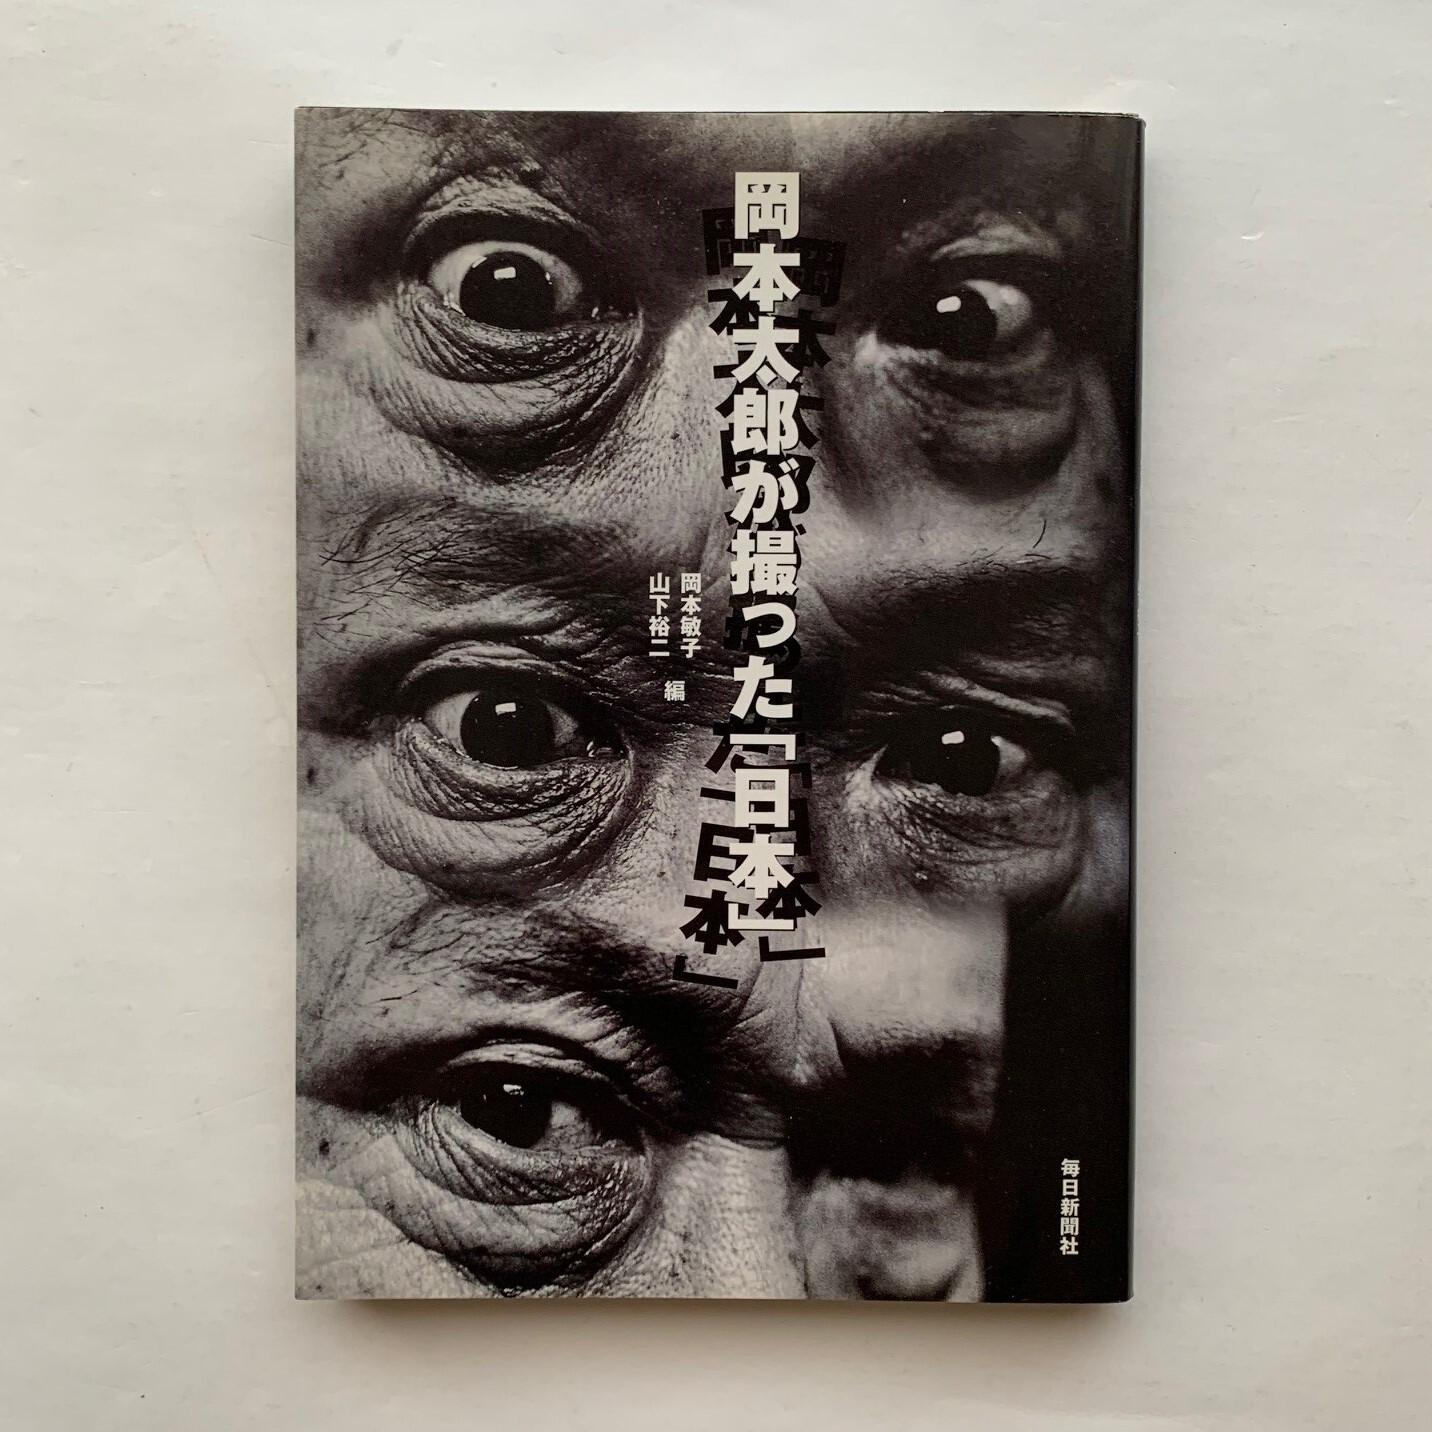 岡本太郎が撮った「日本」/ 岡本 敏子 (編集) / 山下 裕二 (編集)